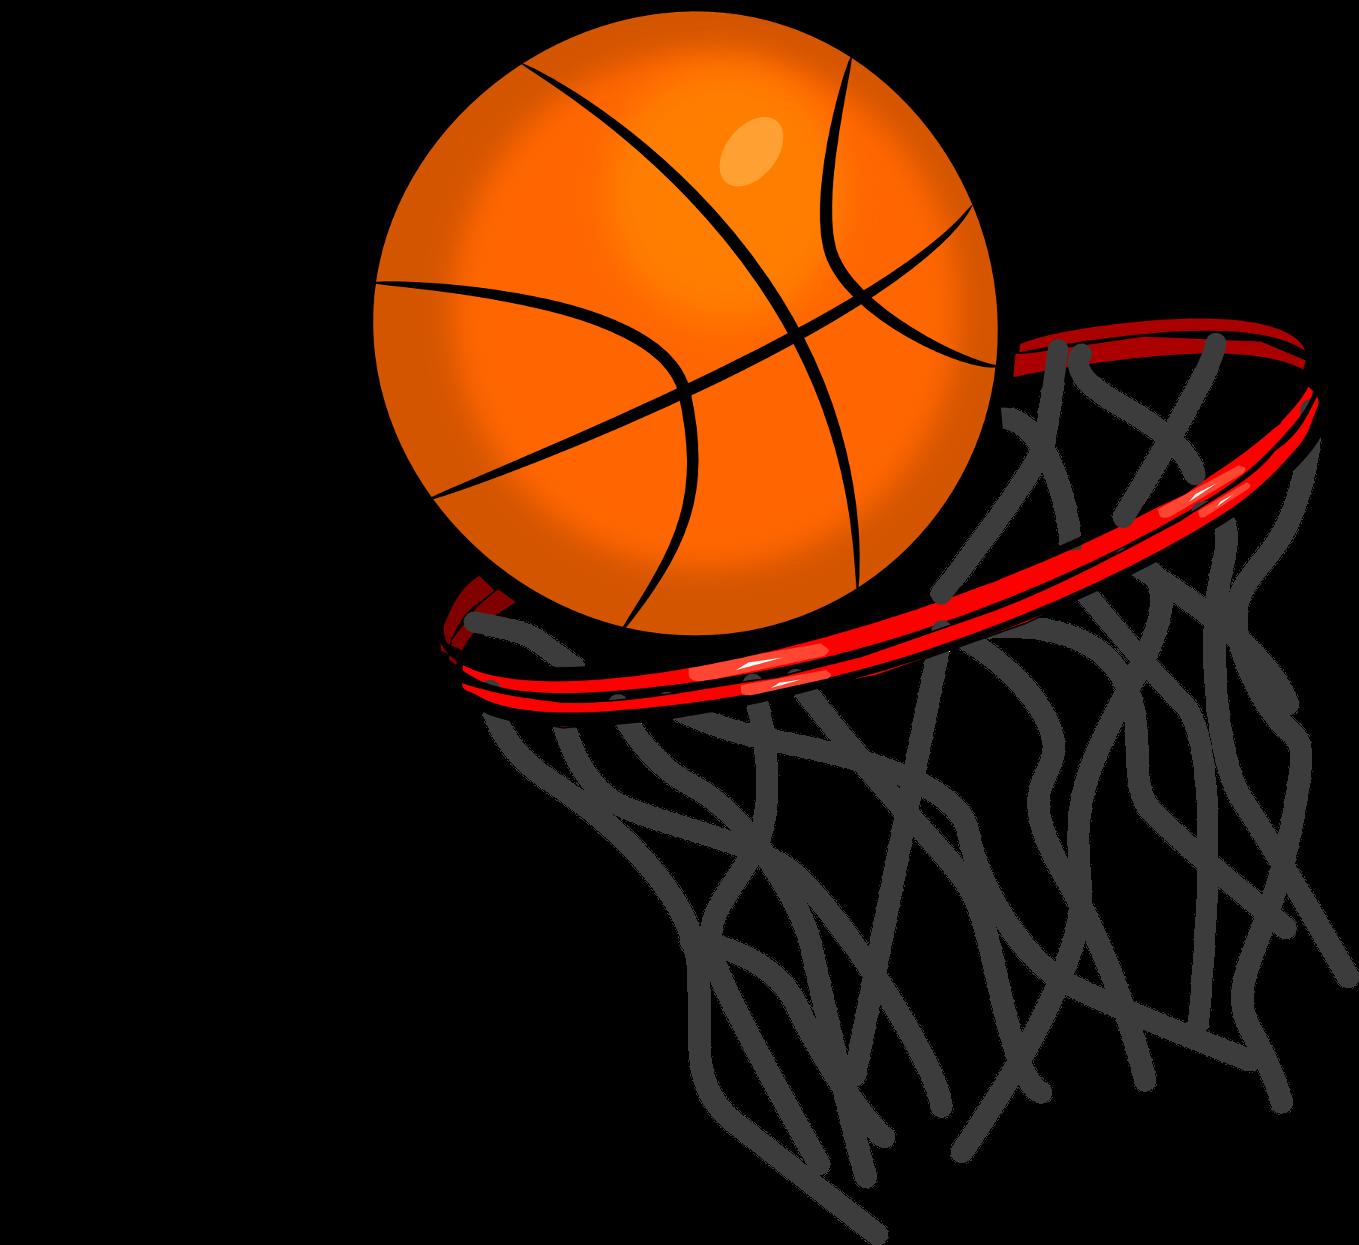 Basket clipart basketball practice Com – Collection net basketball